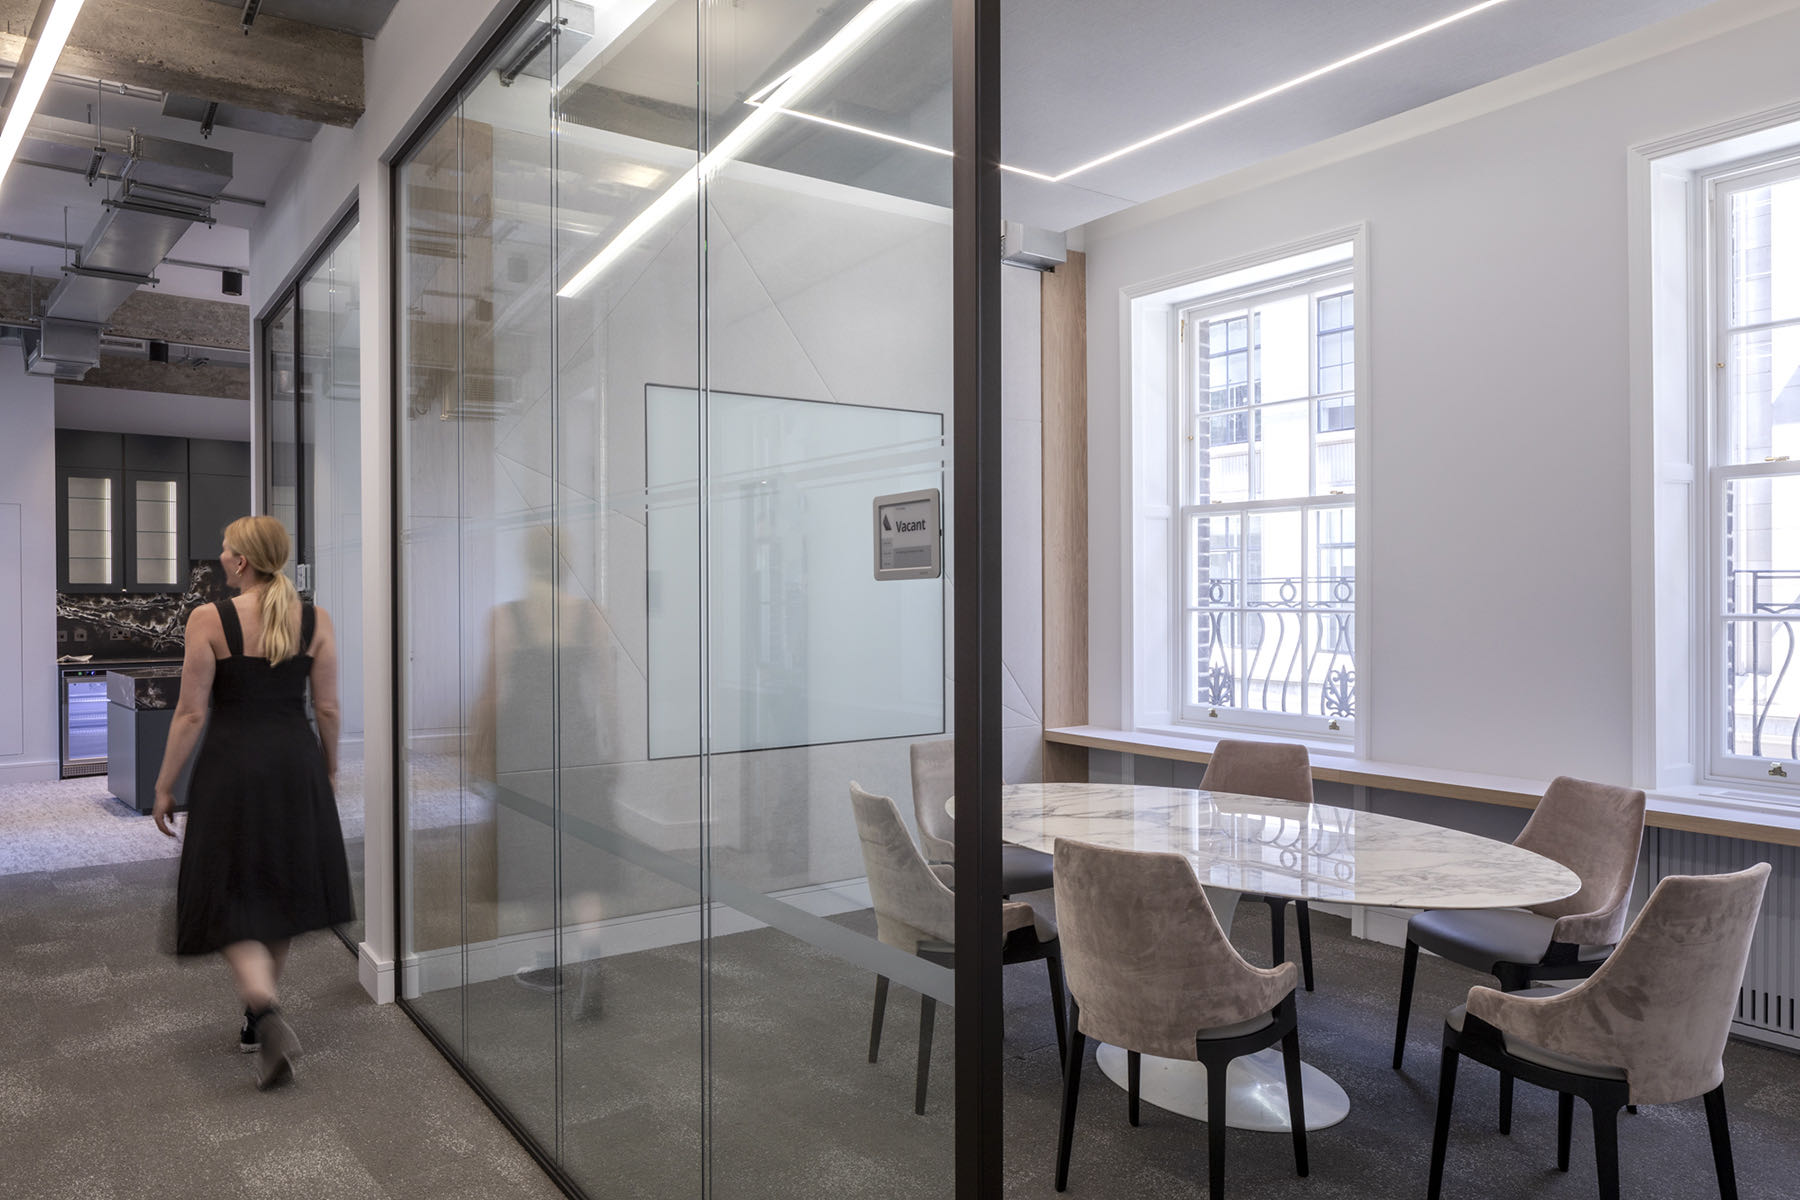 fredericks-place-london-office-10